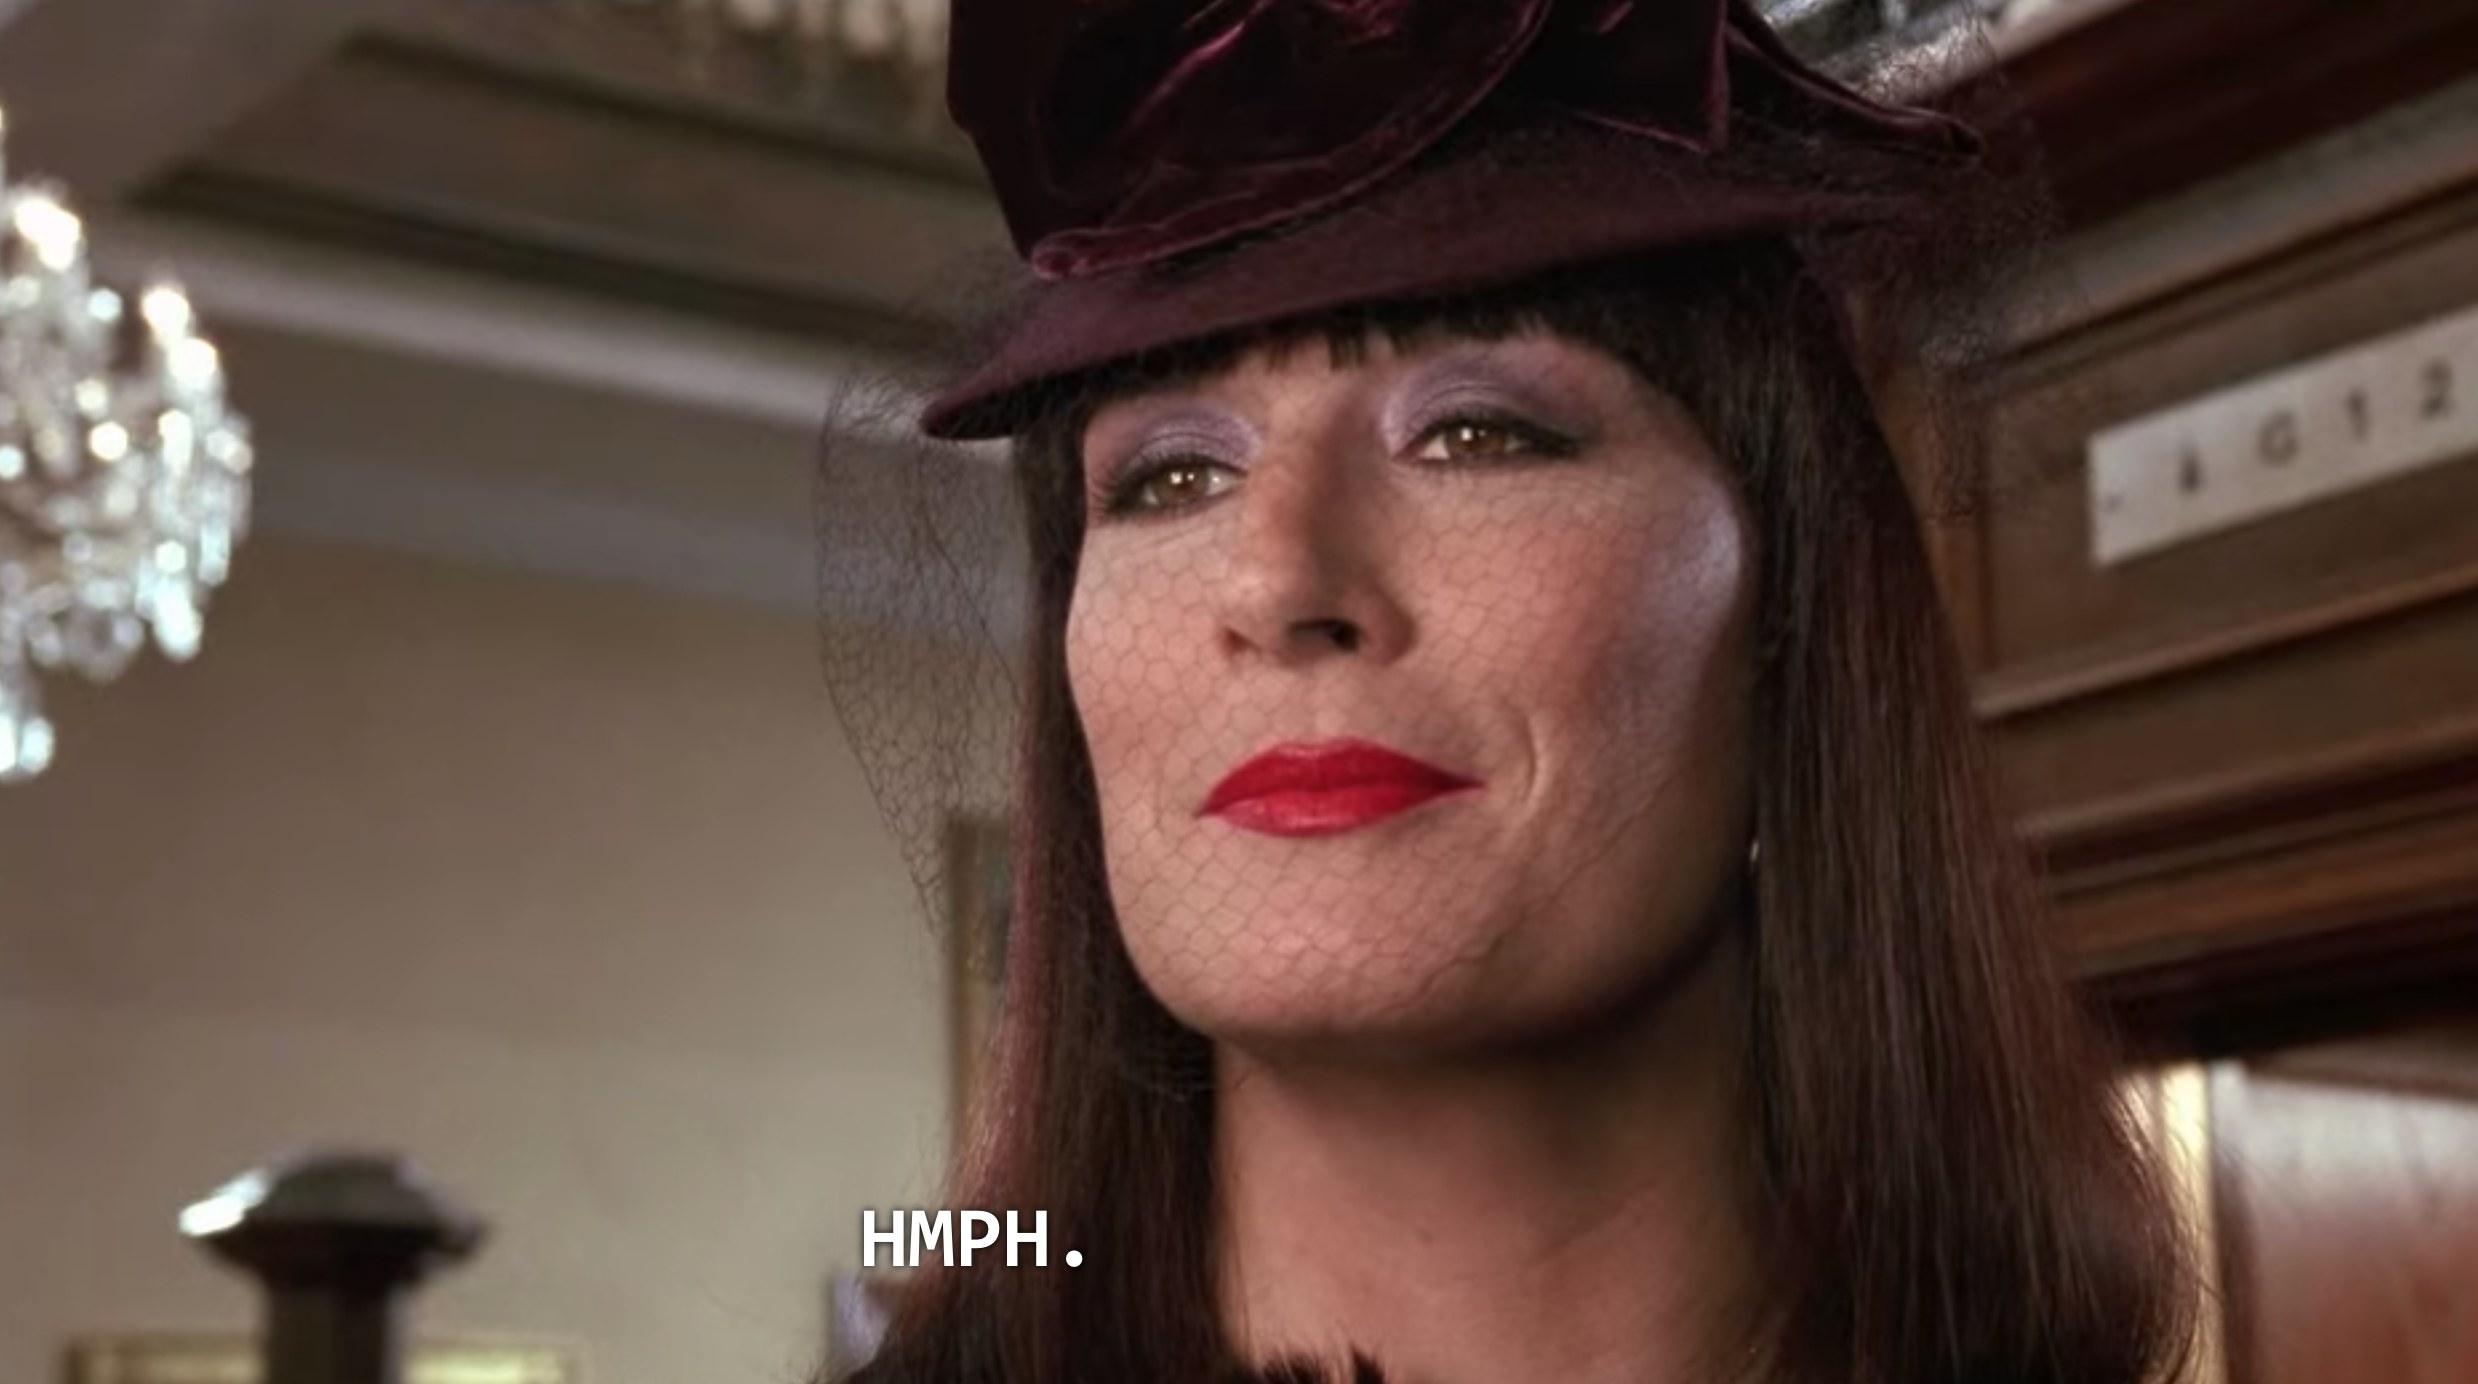 Anjelica Huston with a dark purple hat